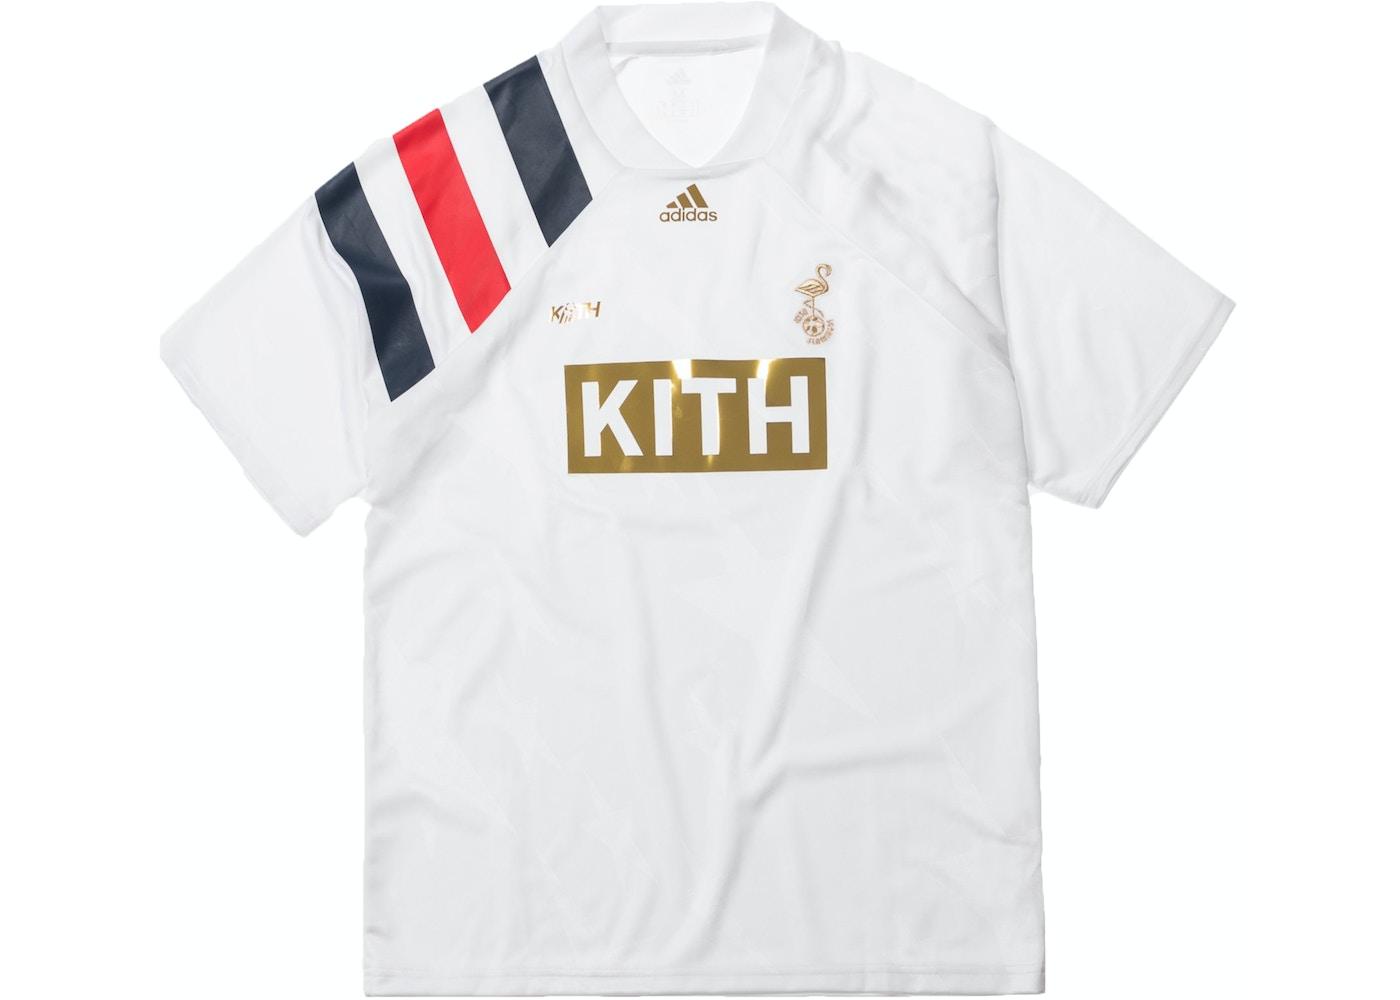 b25019e7 Kith x adidas Match Jersey Flamingos Home. x adidas Match